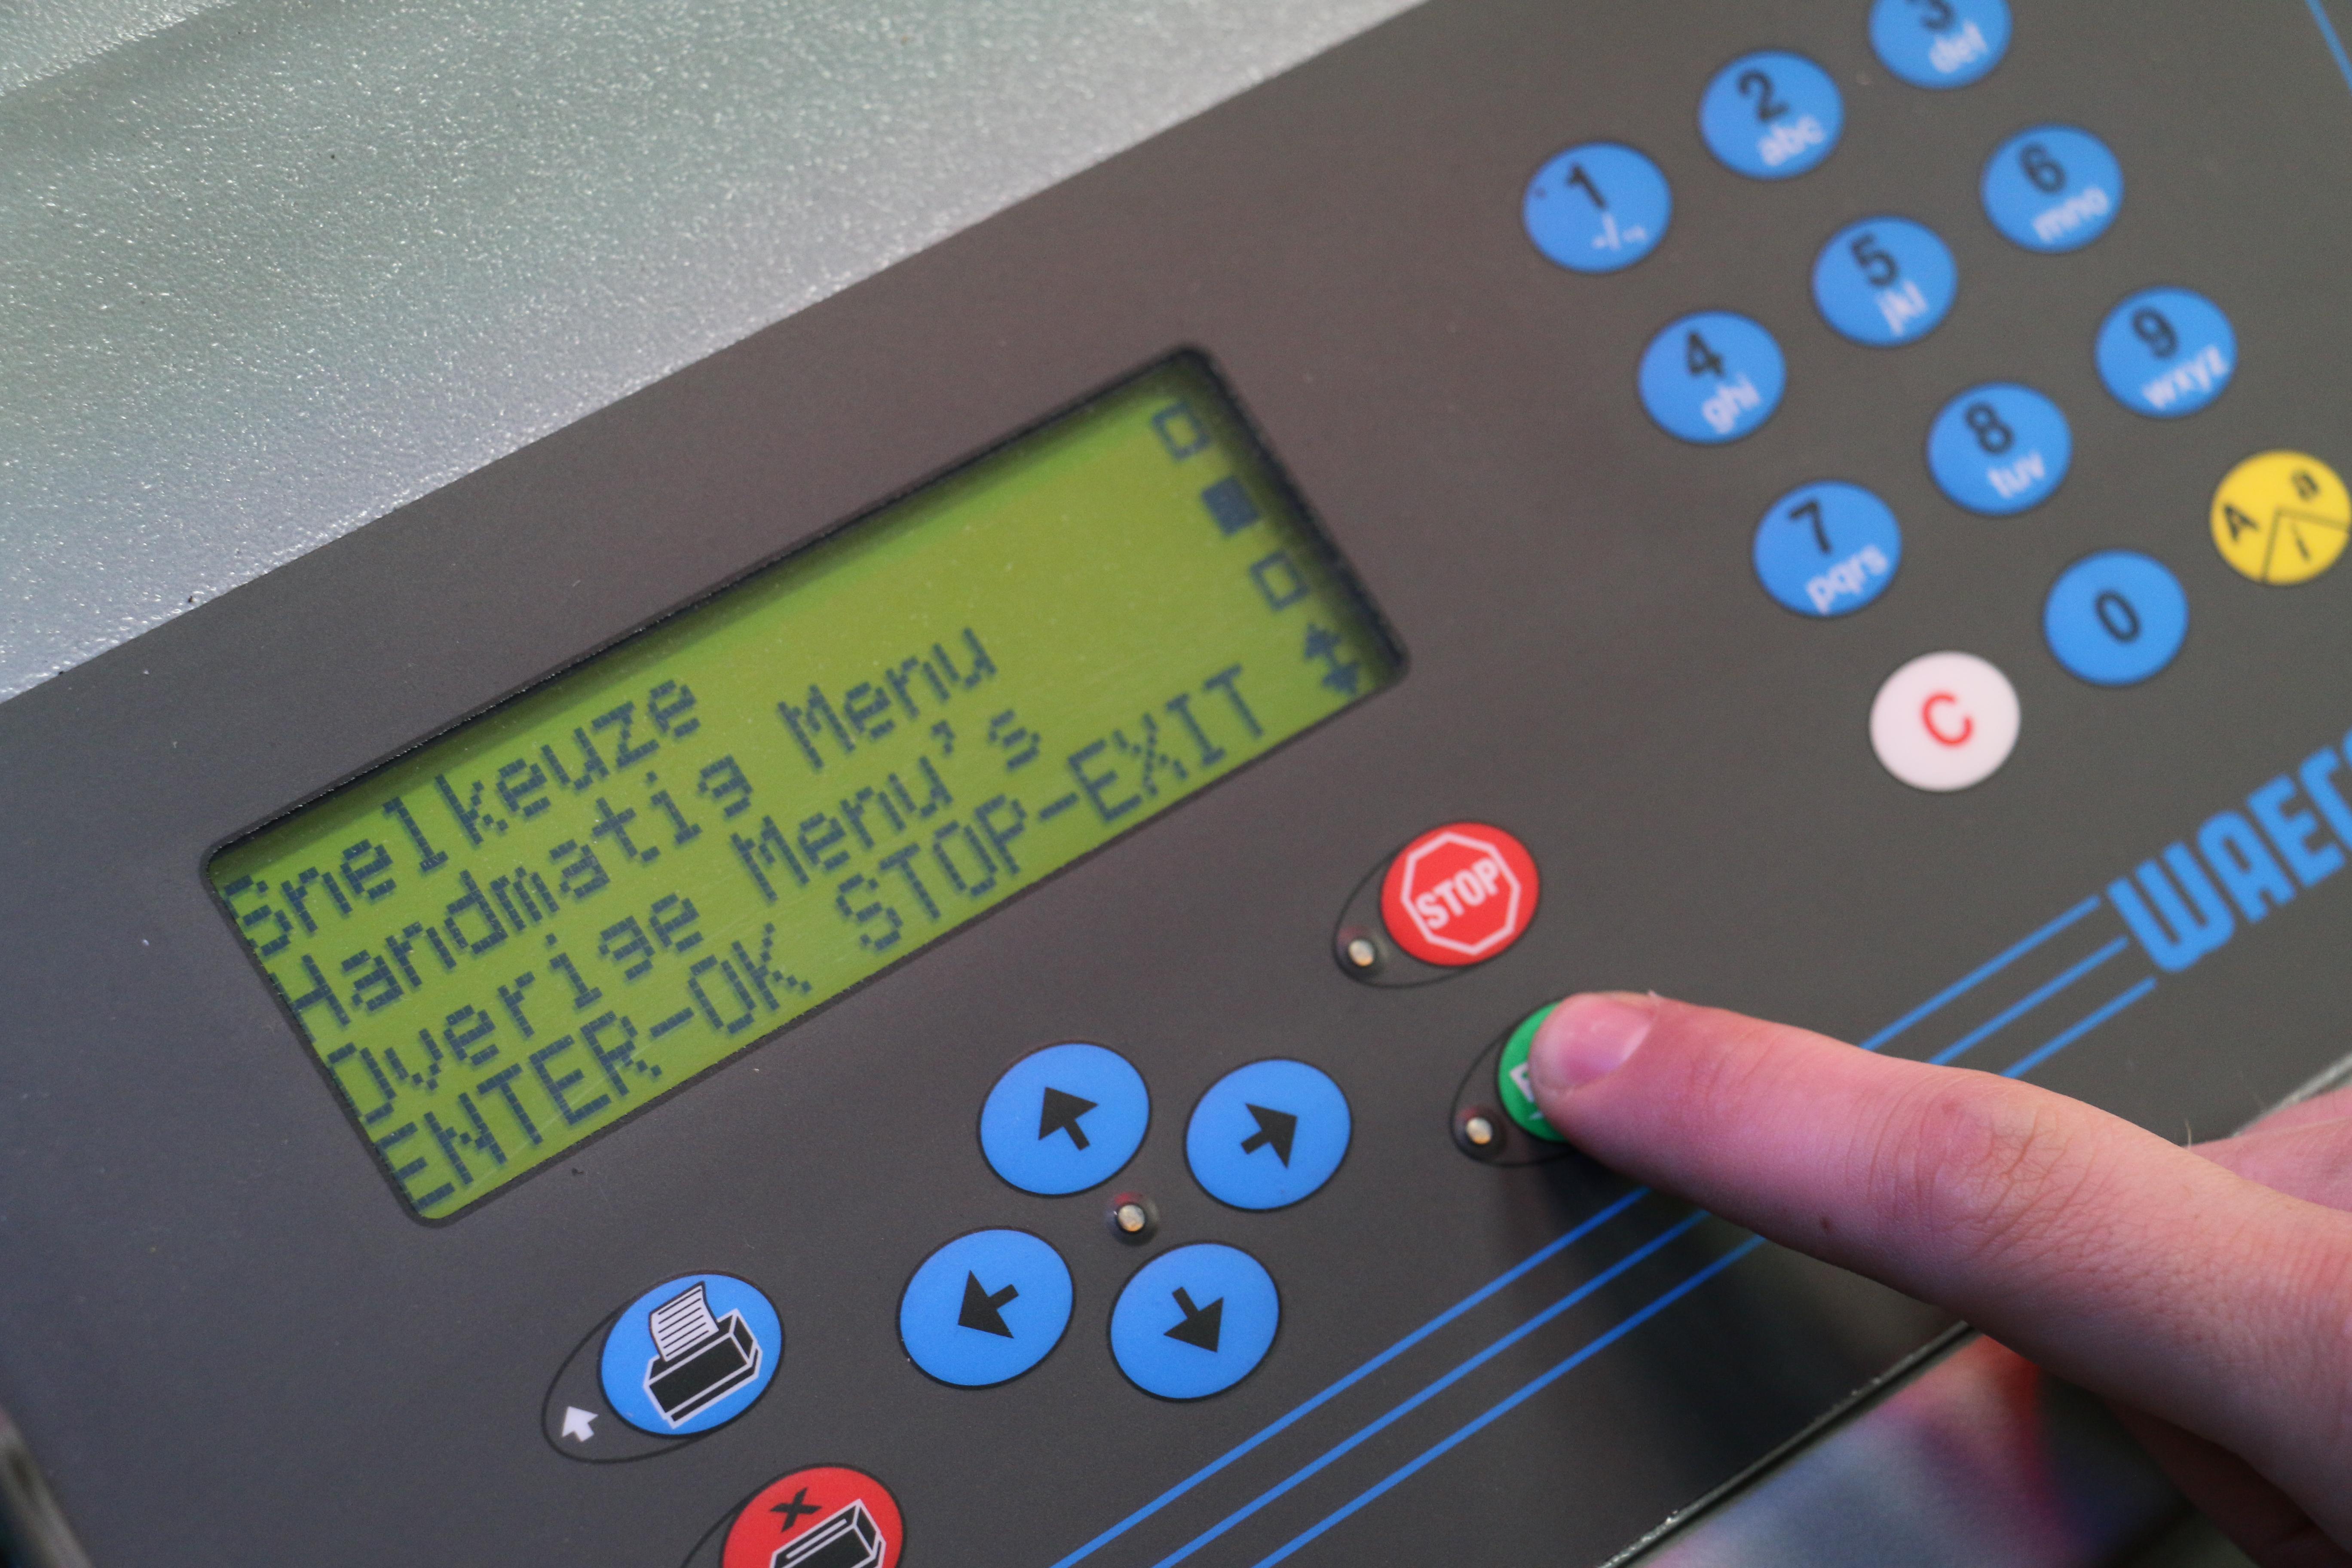 Handmatige instelling aircoserviceapparaat